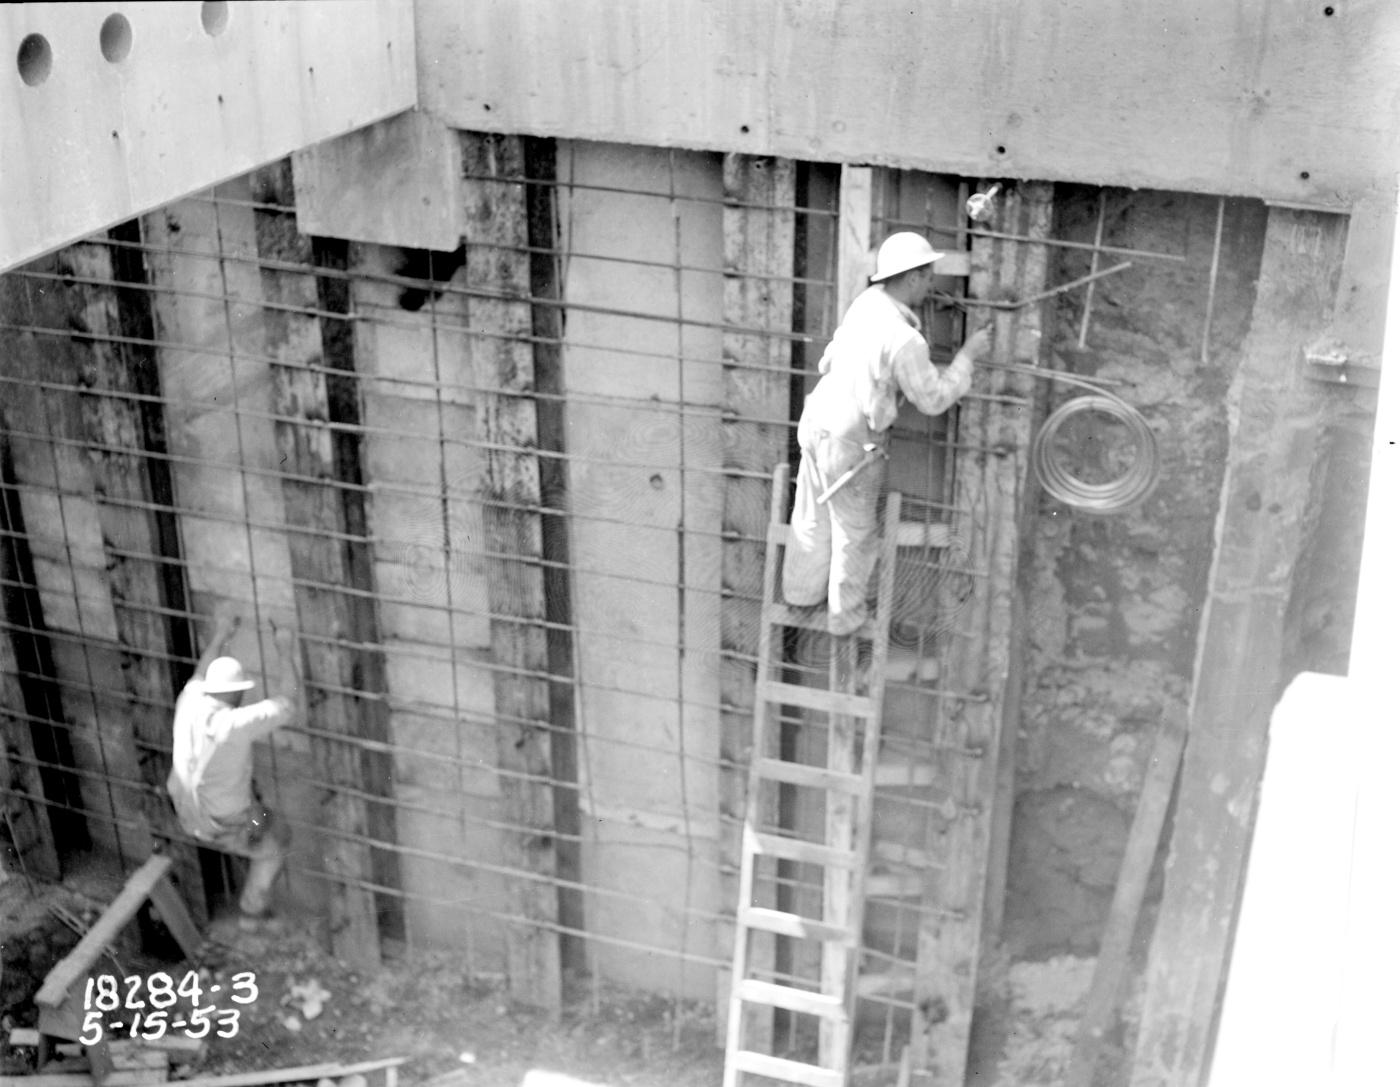 File:Seattle - Battery Street Tunnel under construction - 1953 jpg